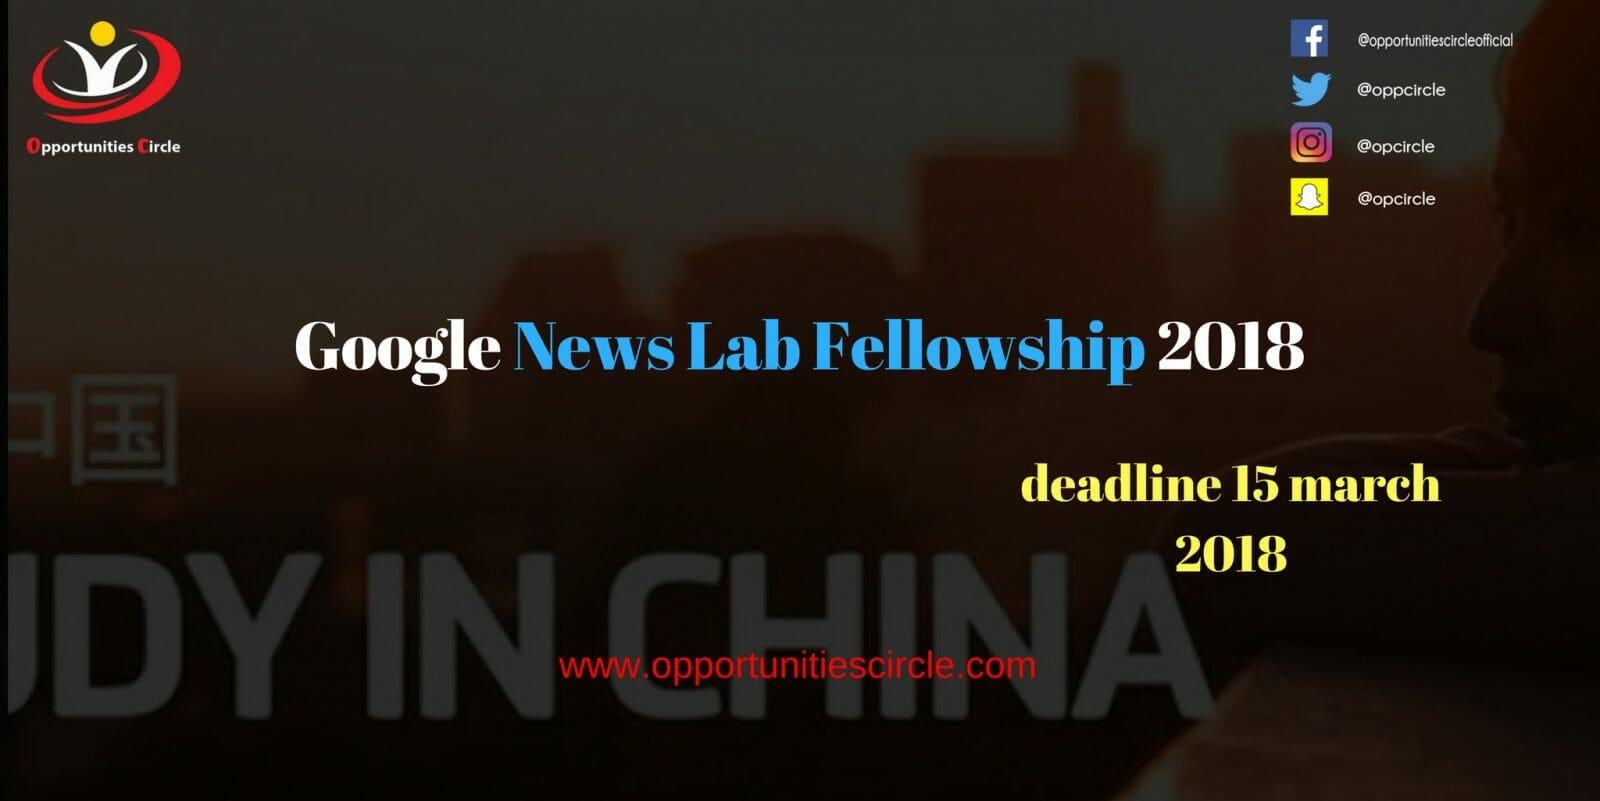 Google News Lab Fellowship 2018 - Google News Lab Fellowship 2018